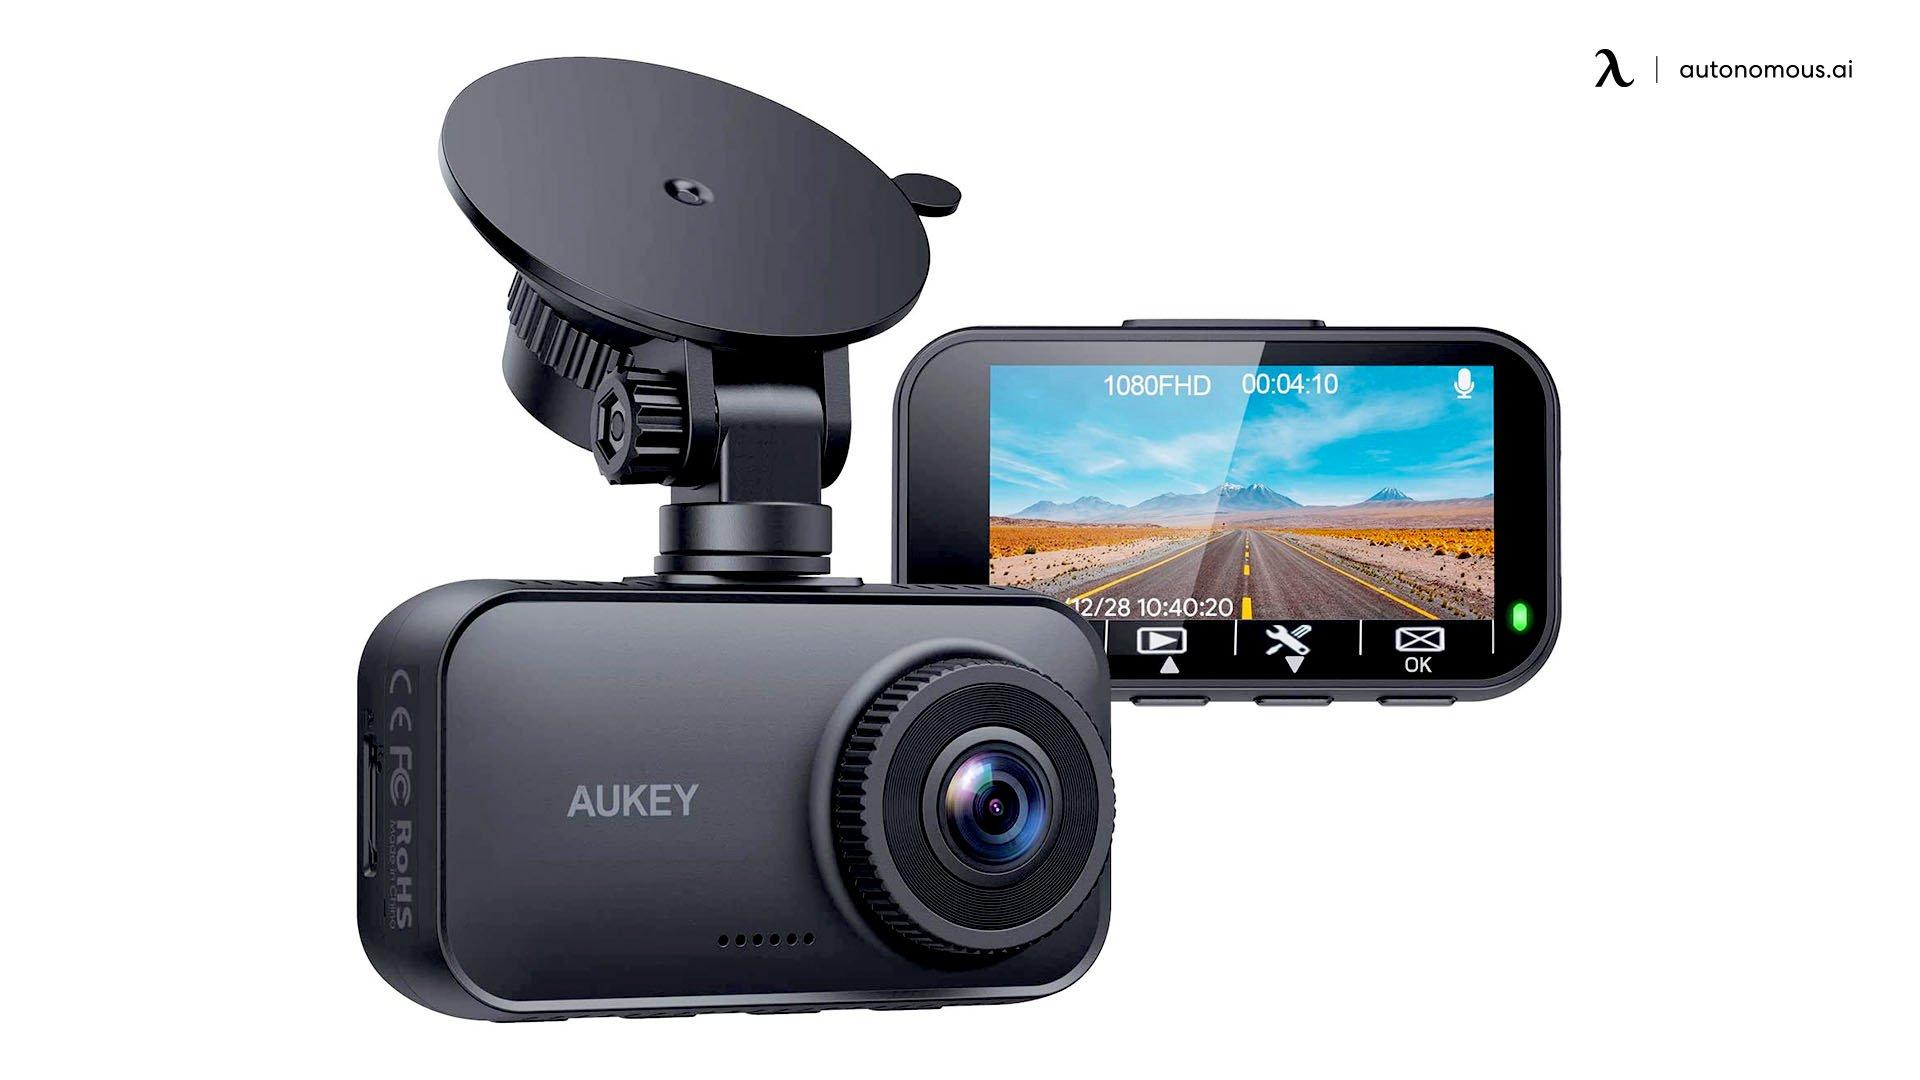 AUKEY 1080p Wide